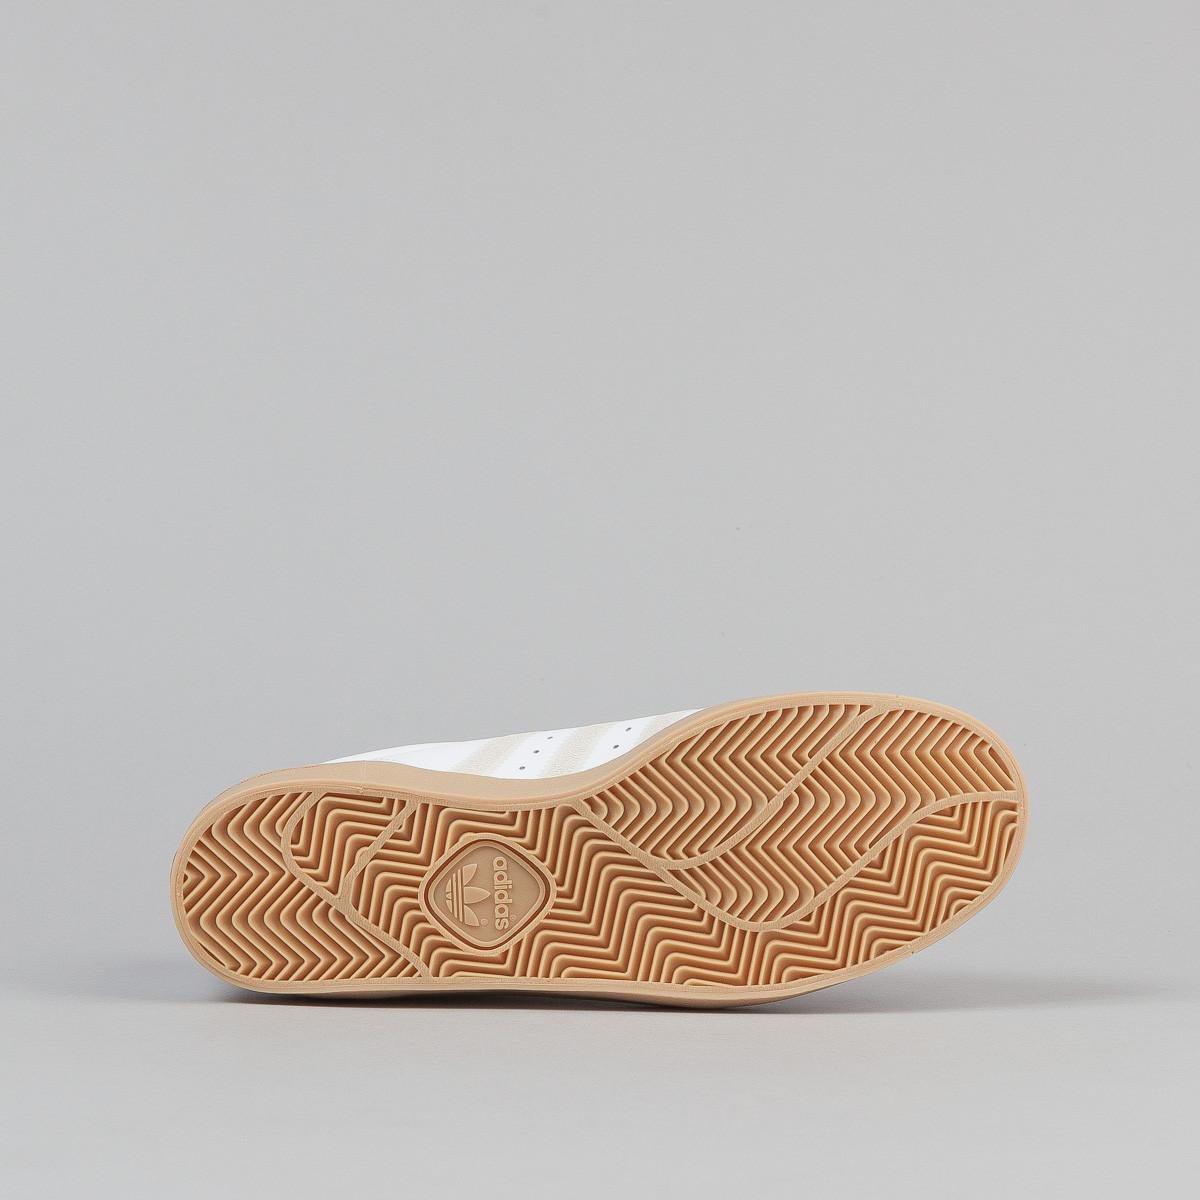 adidas-superstar-vulc-shoes-ftwr-white-ftwr-white-gum-5